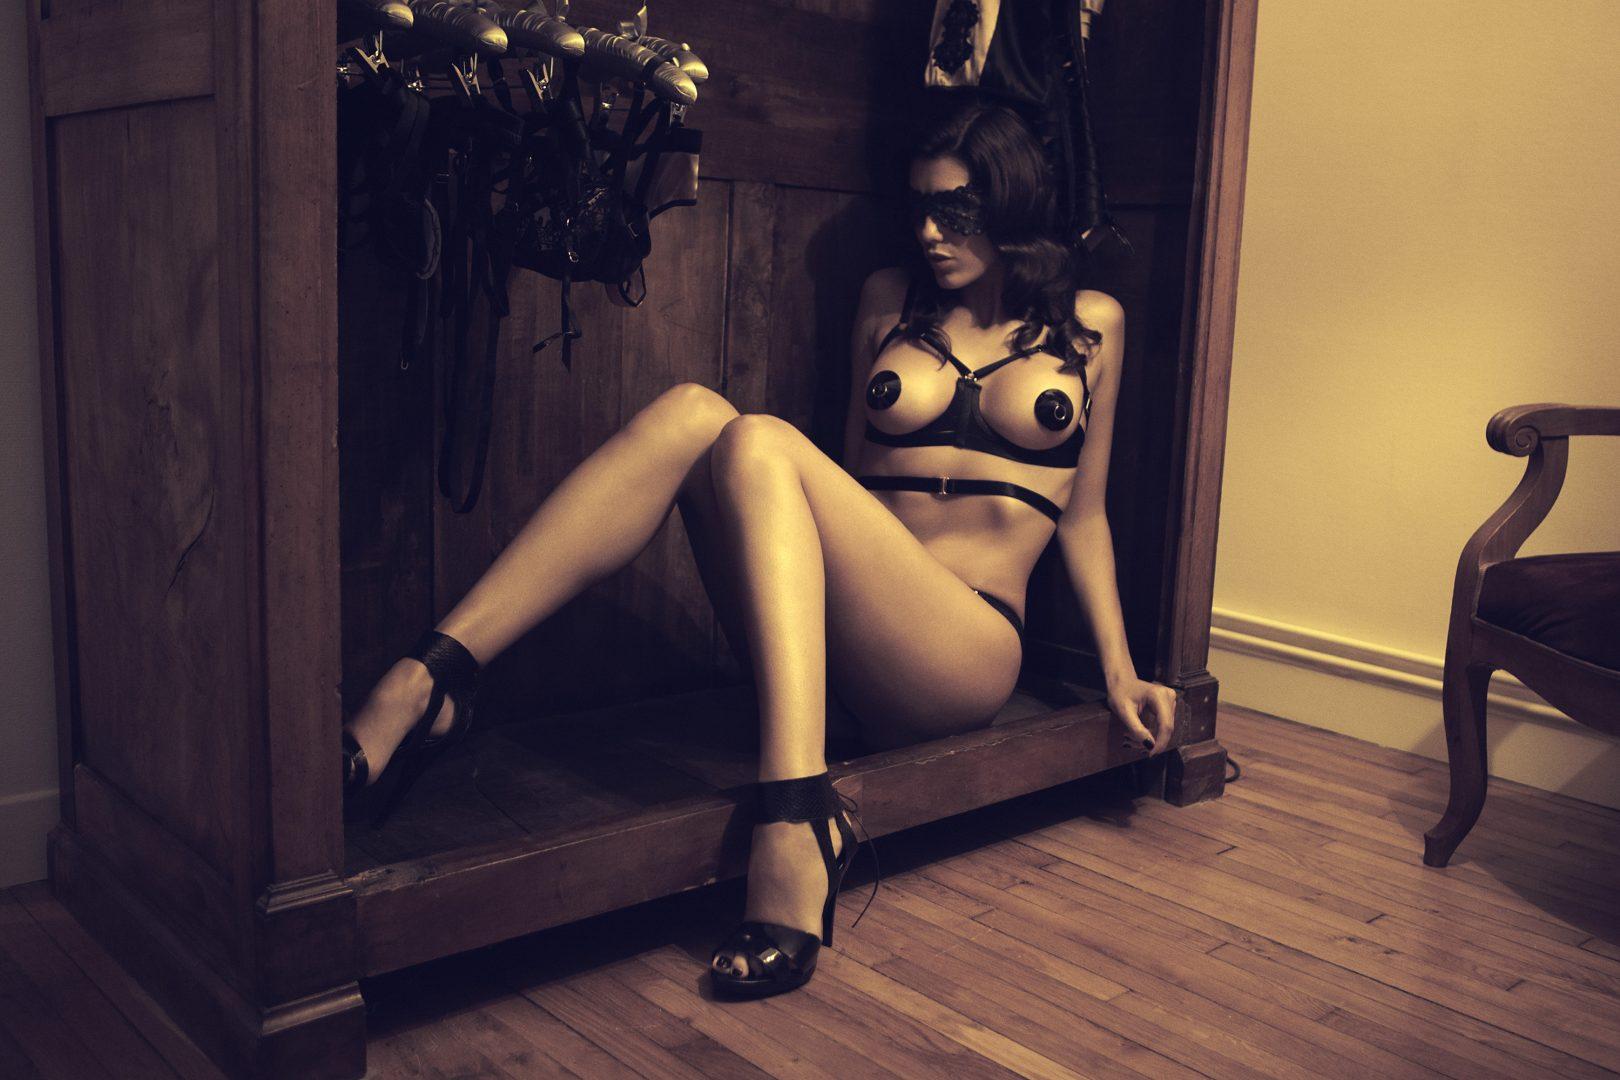 Girl on lingerie sitting in a closet by Stefan Rappo